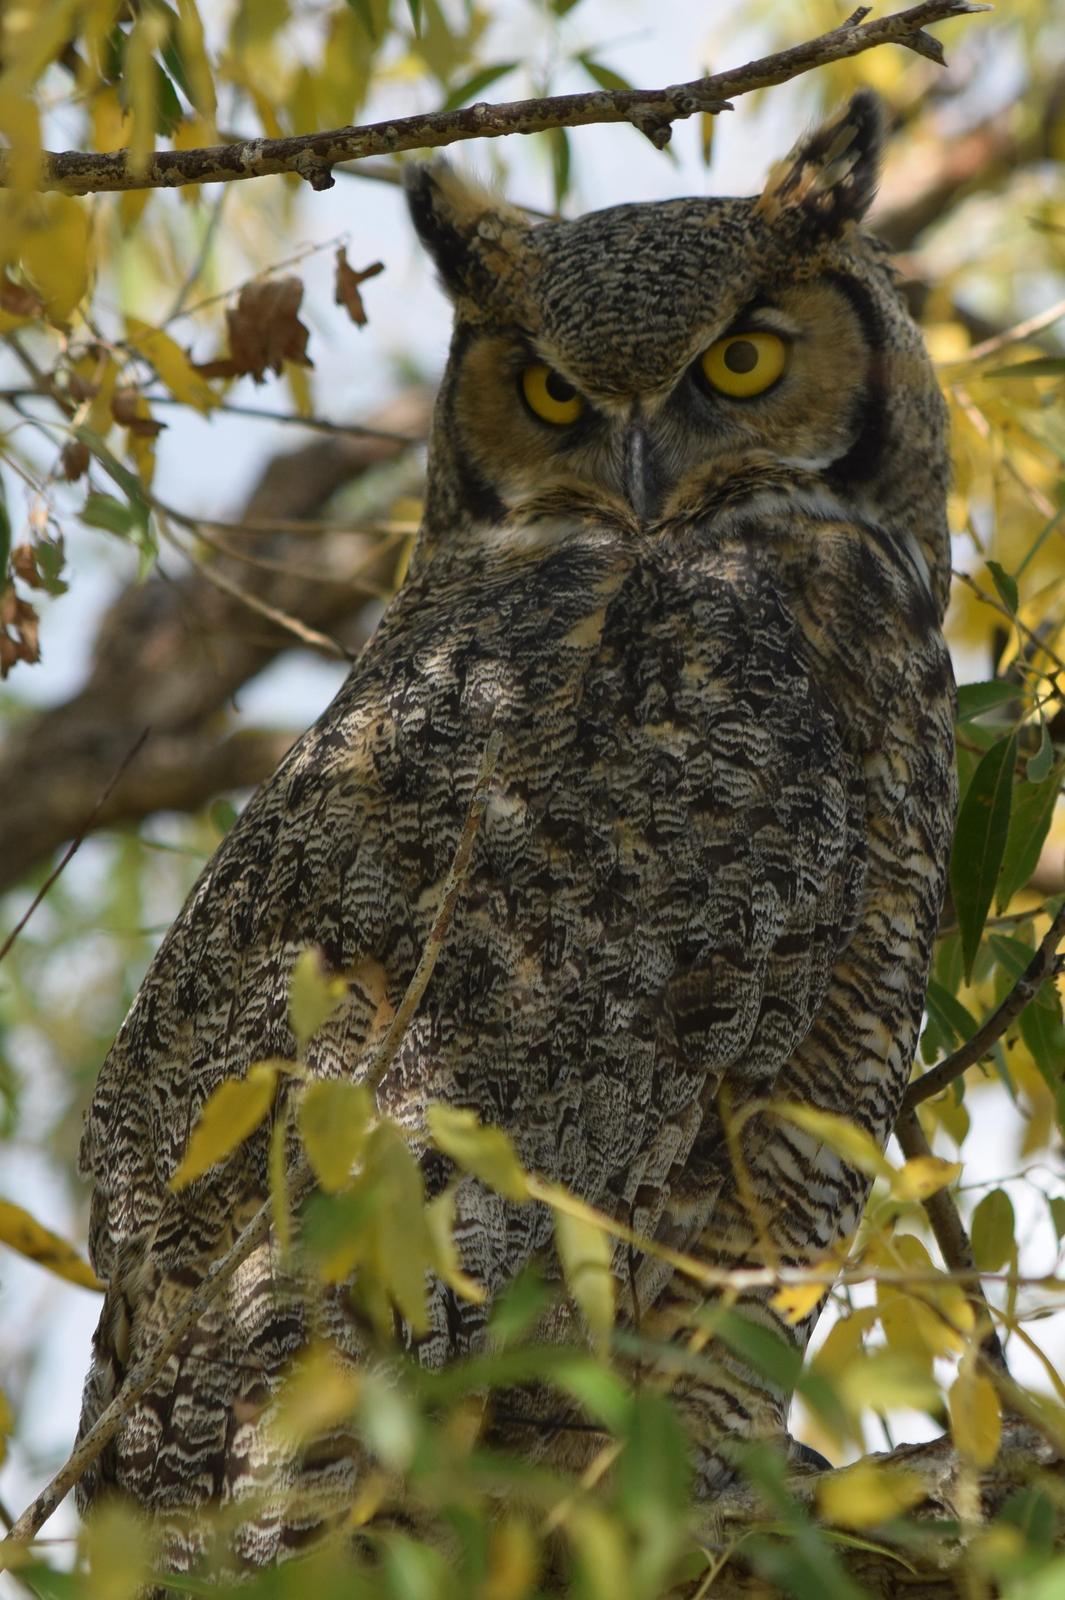 Great Horned Owl Photo by Ken Shawcroft